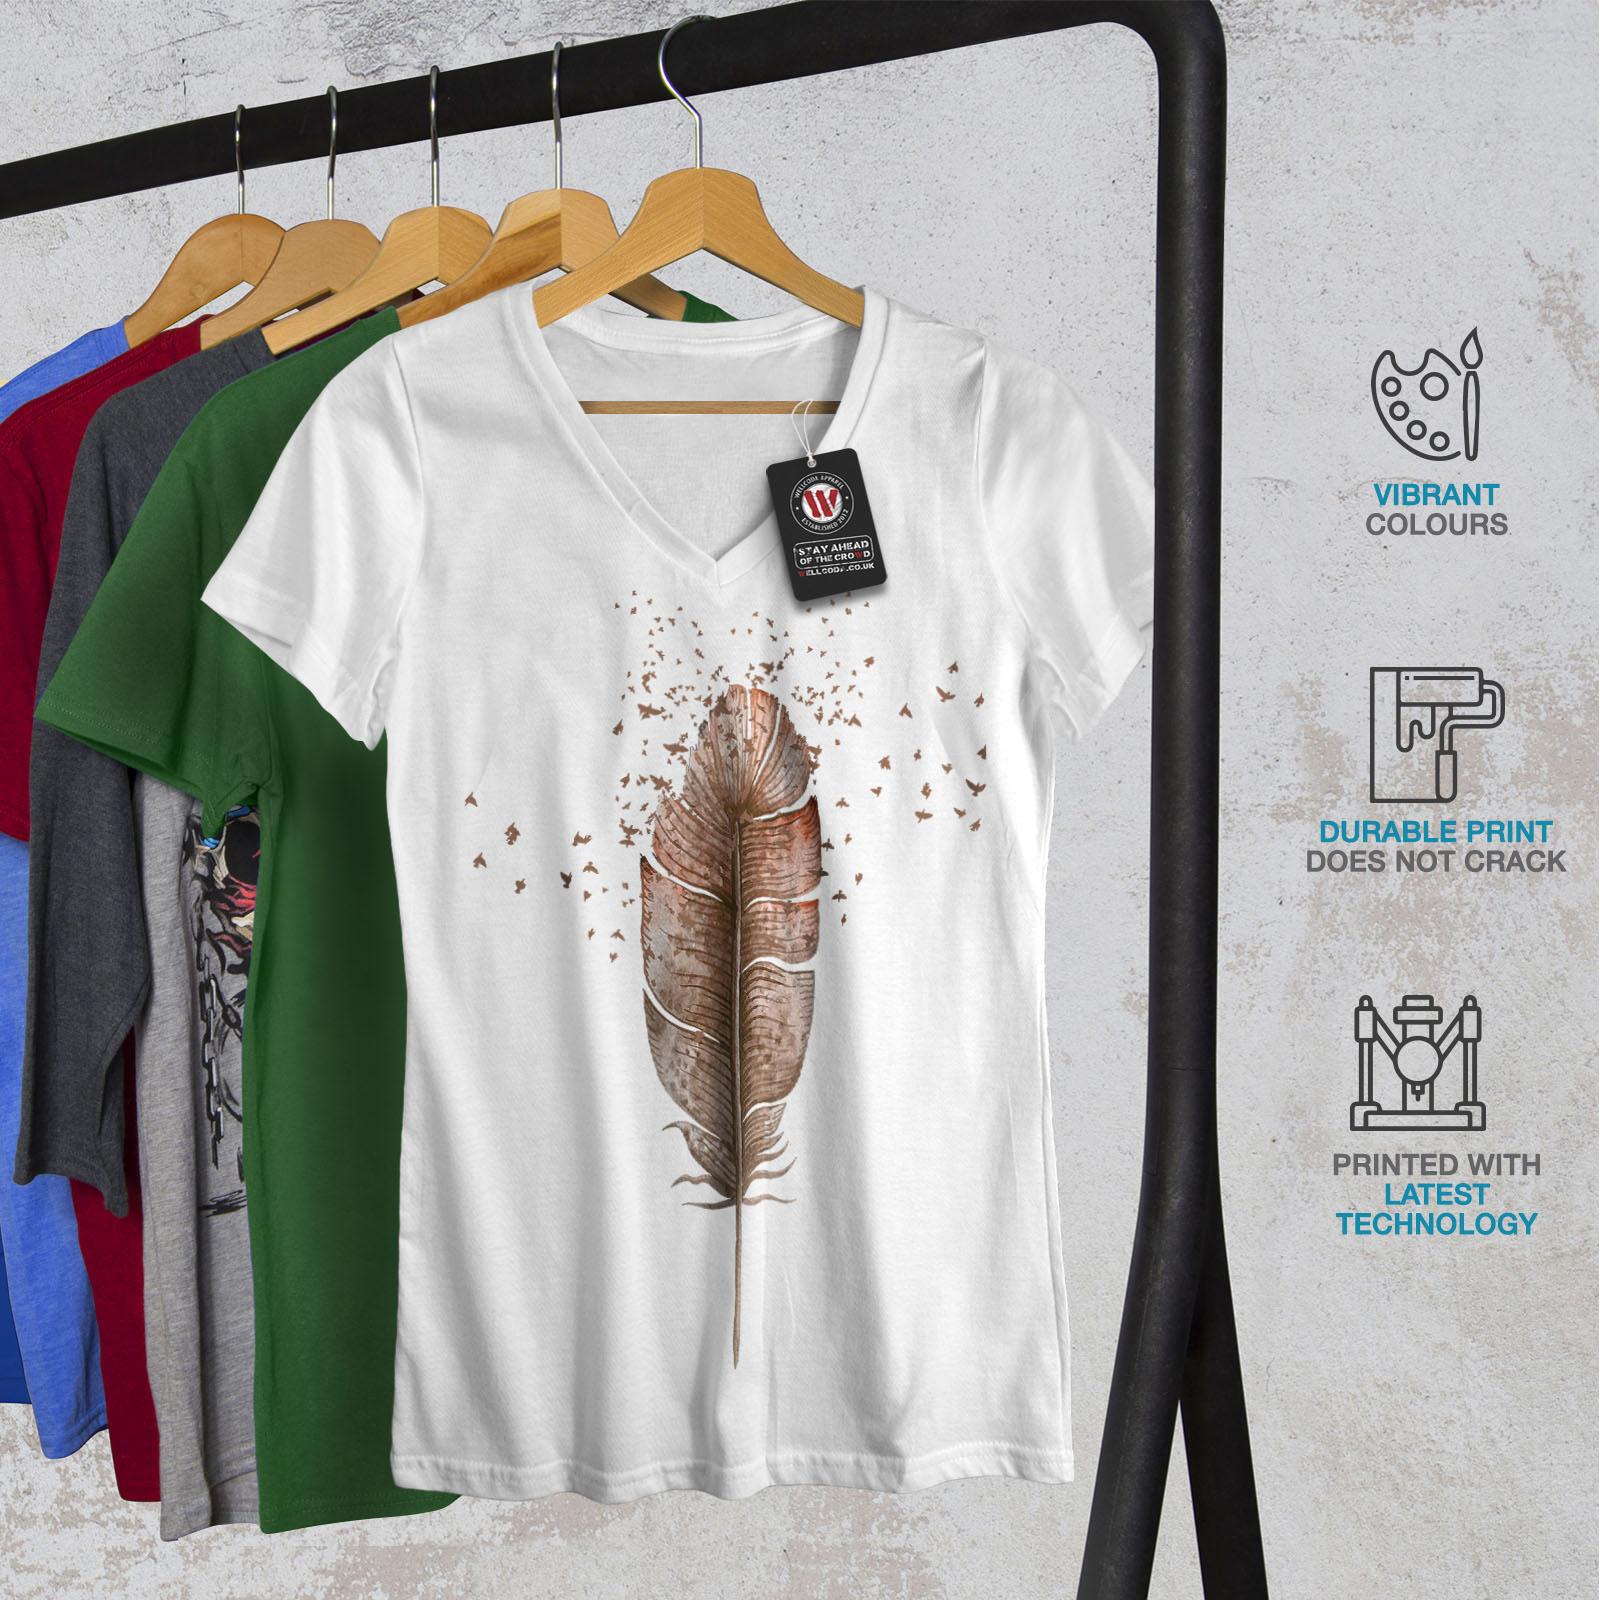 Wellcoda-Soft-Bird-Feather-Womens-V-Neck-T-shirt-Delicate-Graphic-Design-Tee thumbnail 8